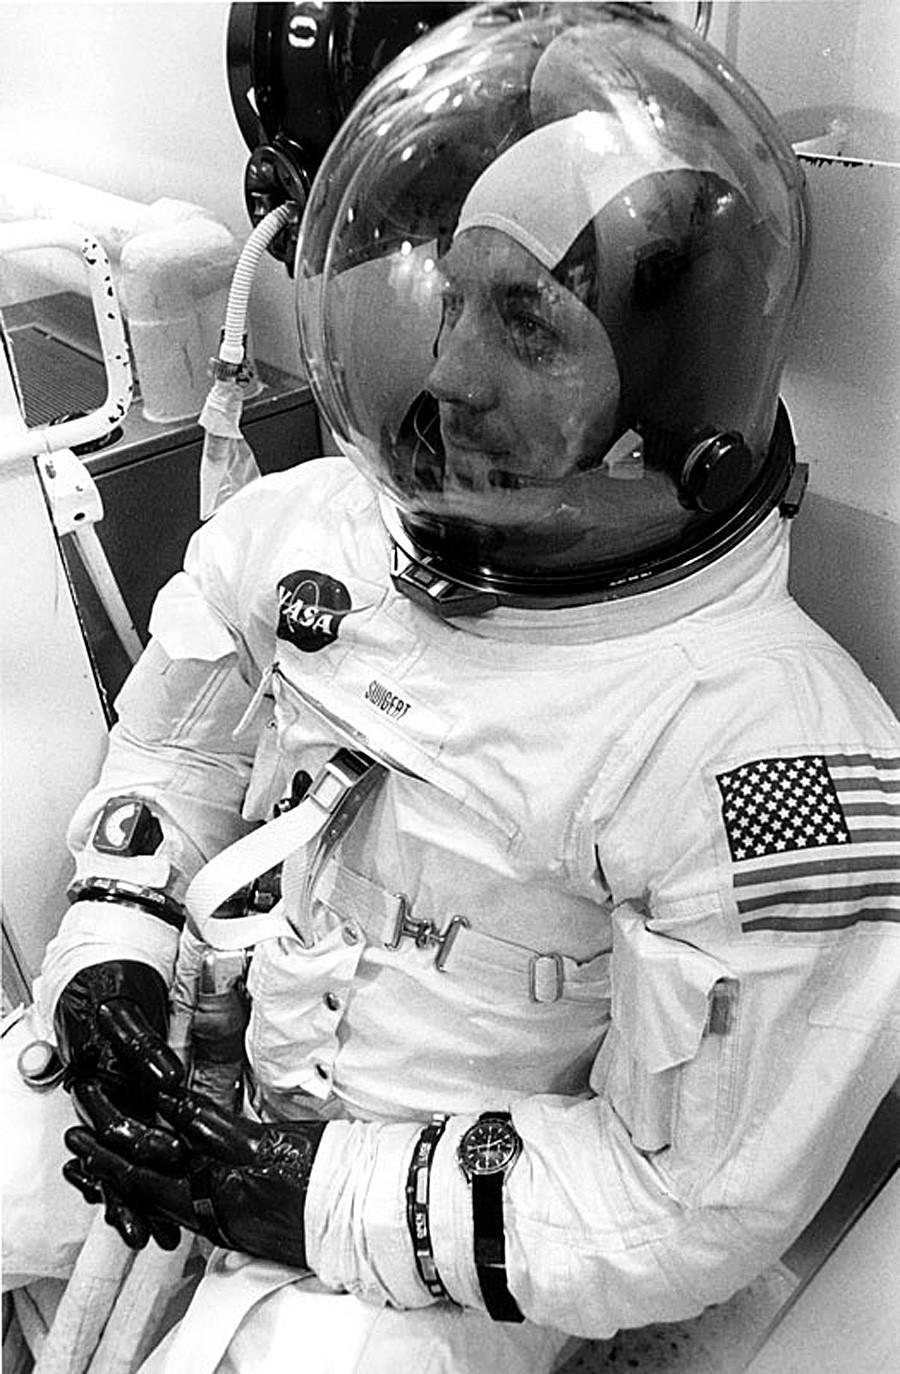 Американскиот астронаут Џек Свигерт носи часовник Омега. 11 април 1970 година.